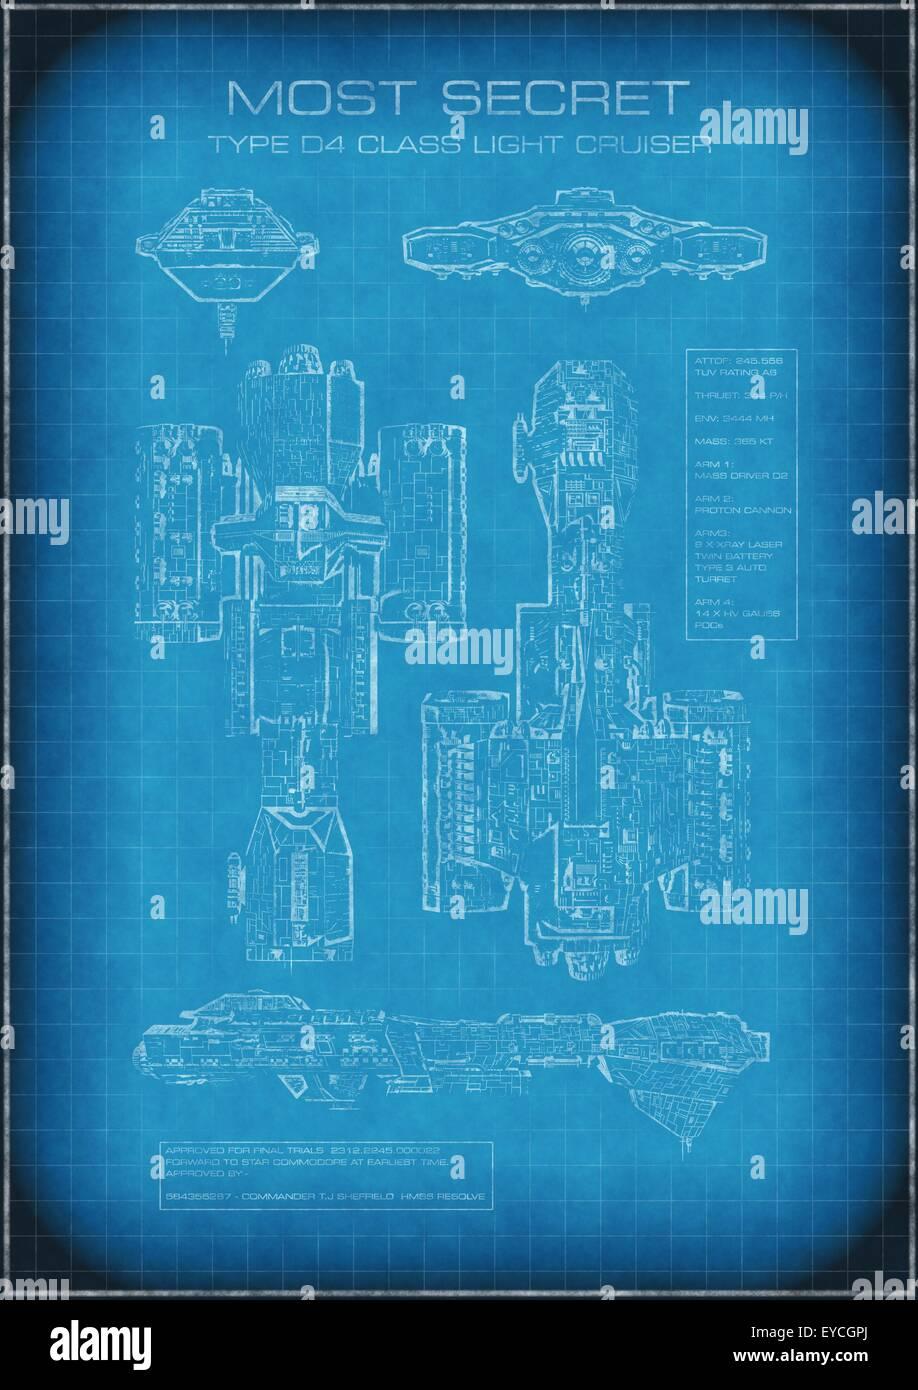 Top secret spaceship blueprint with text stock photo 85713786 alamy top secret spaceship blueprint with text malvernweather Gallery